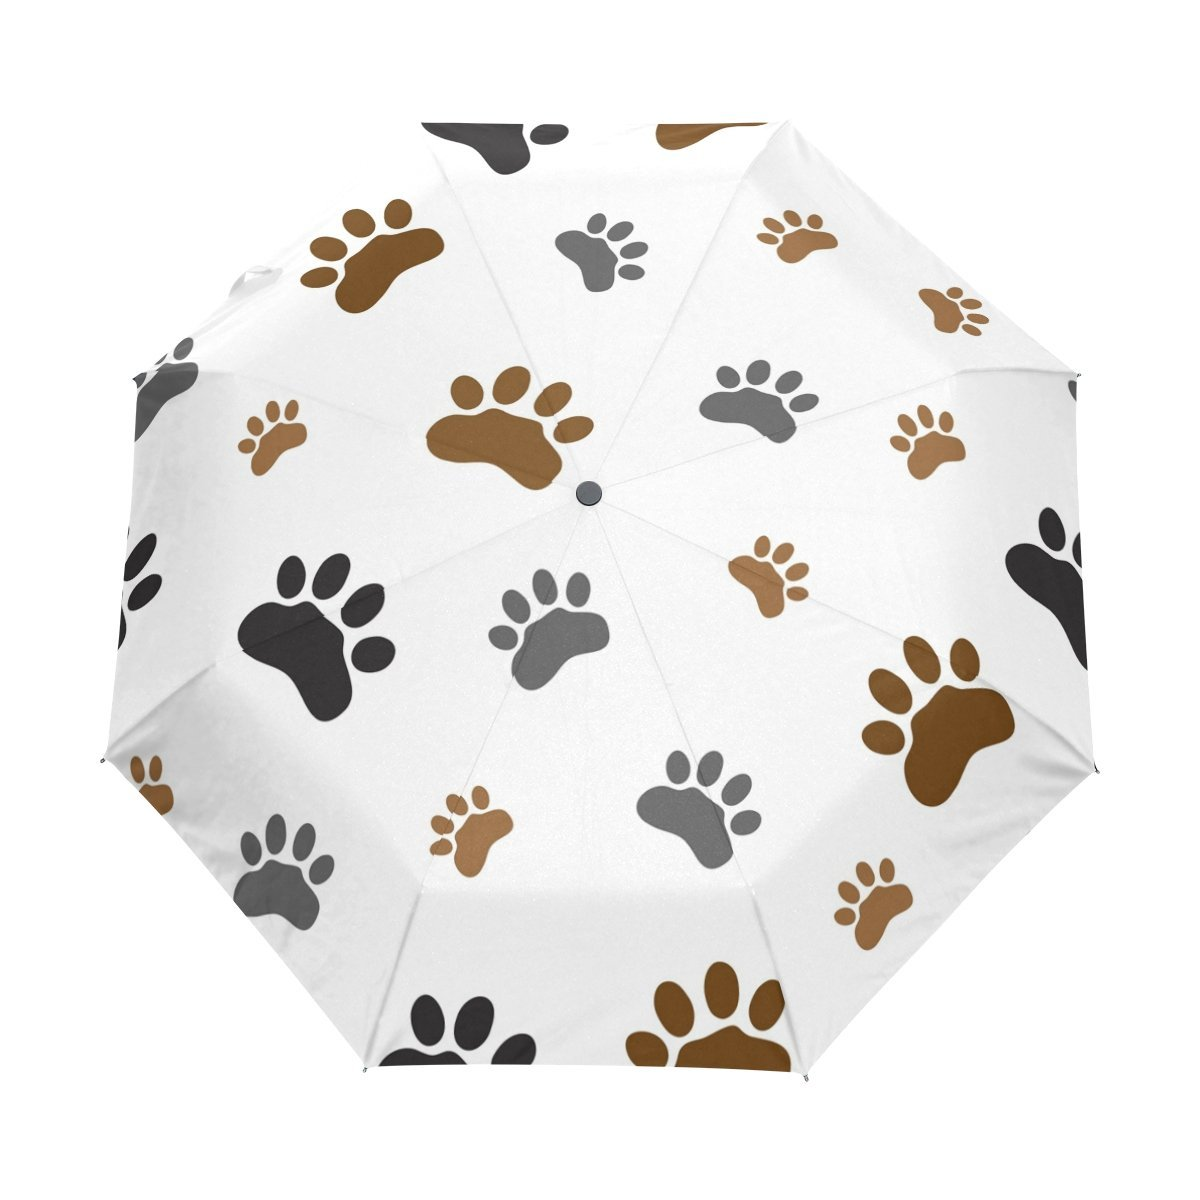 WOZO Hipser Dog Paw Print 3 Folds Auto Open Close Umbrella